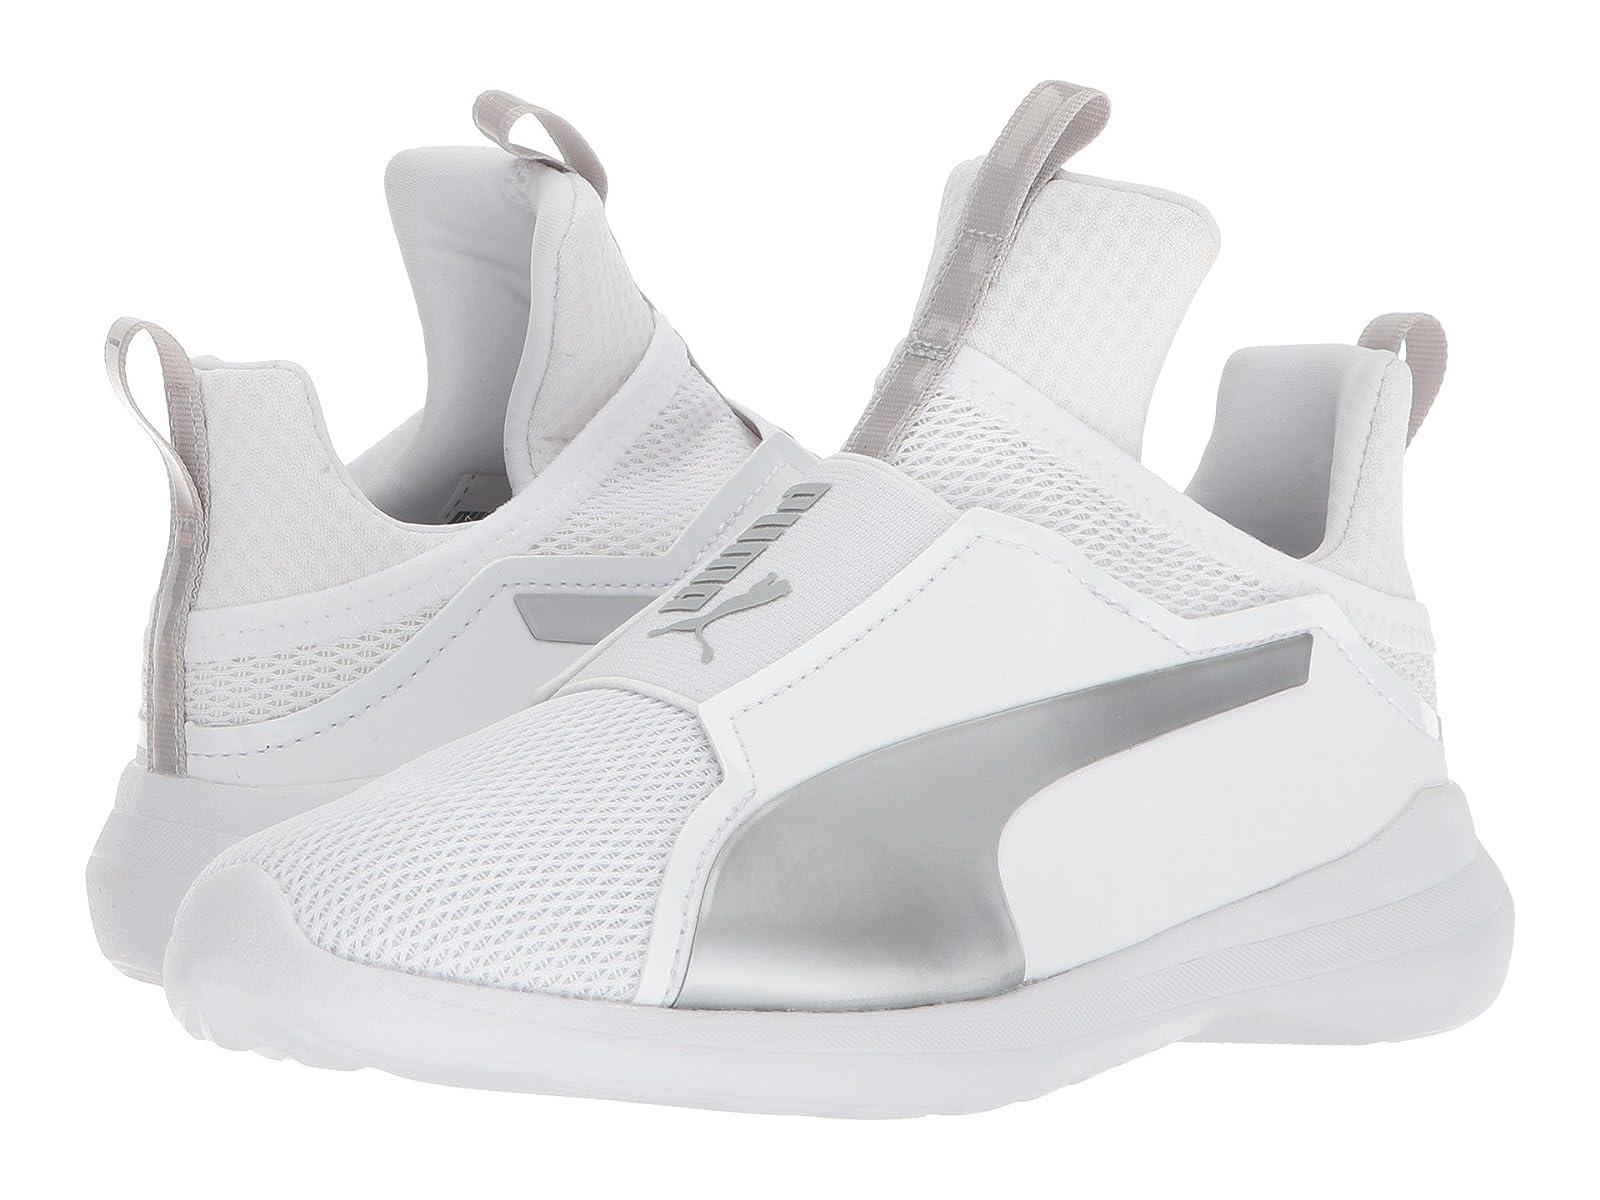 Puma Kids Fierce Core (Little Kid/Big Kid)Cheap and distinctive eye-catching shoes